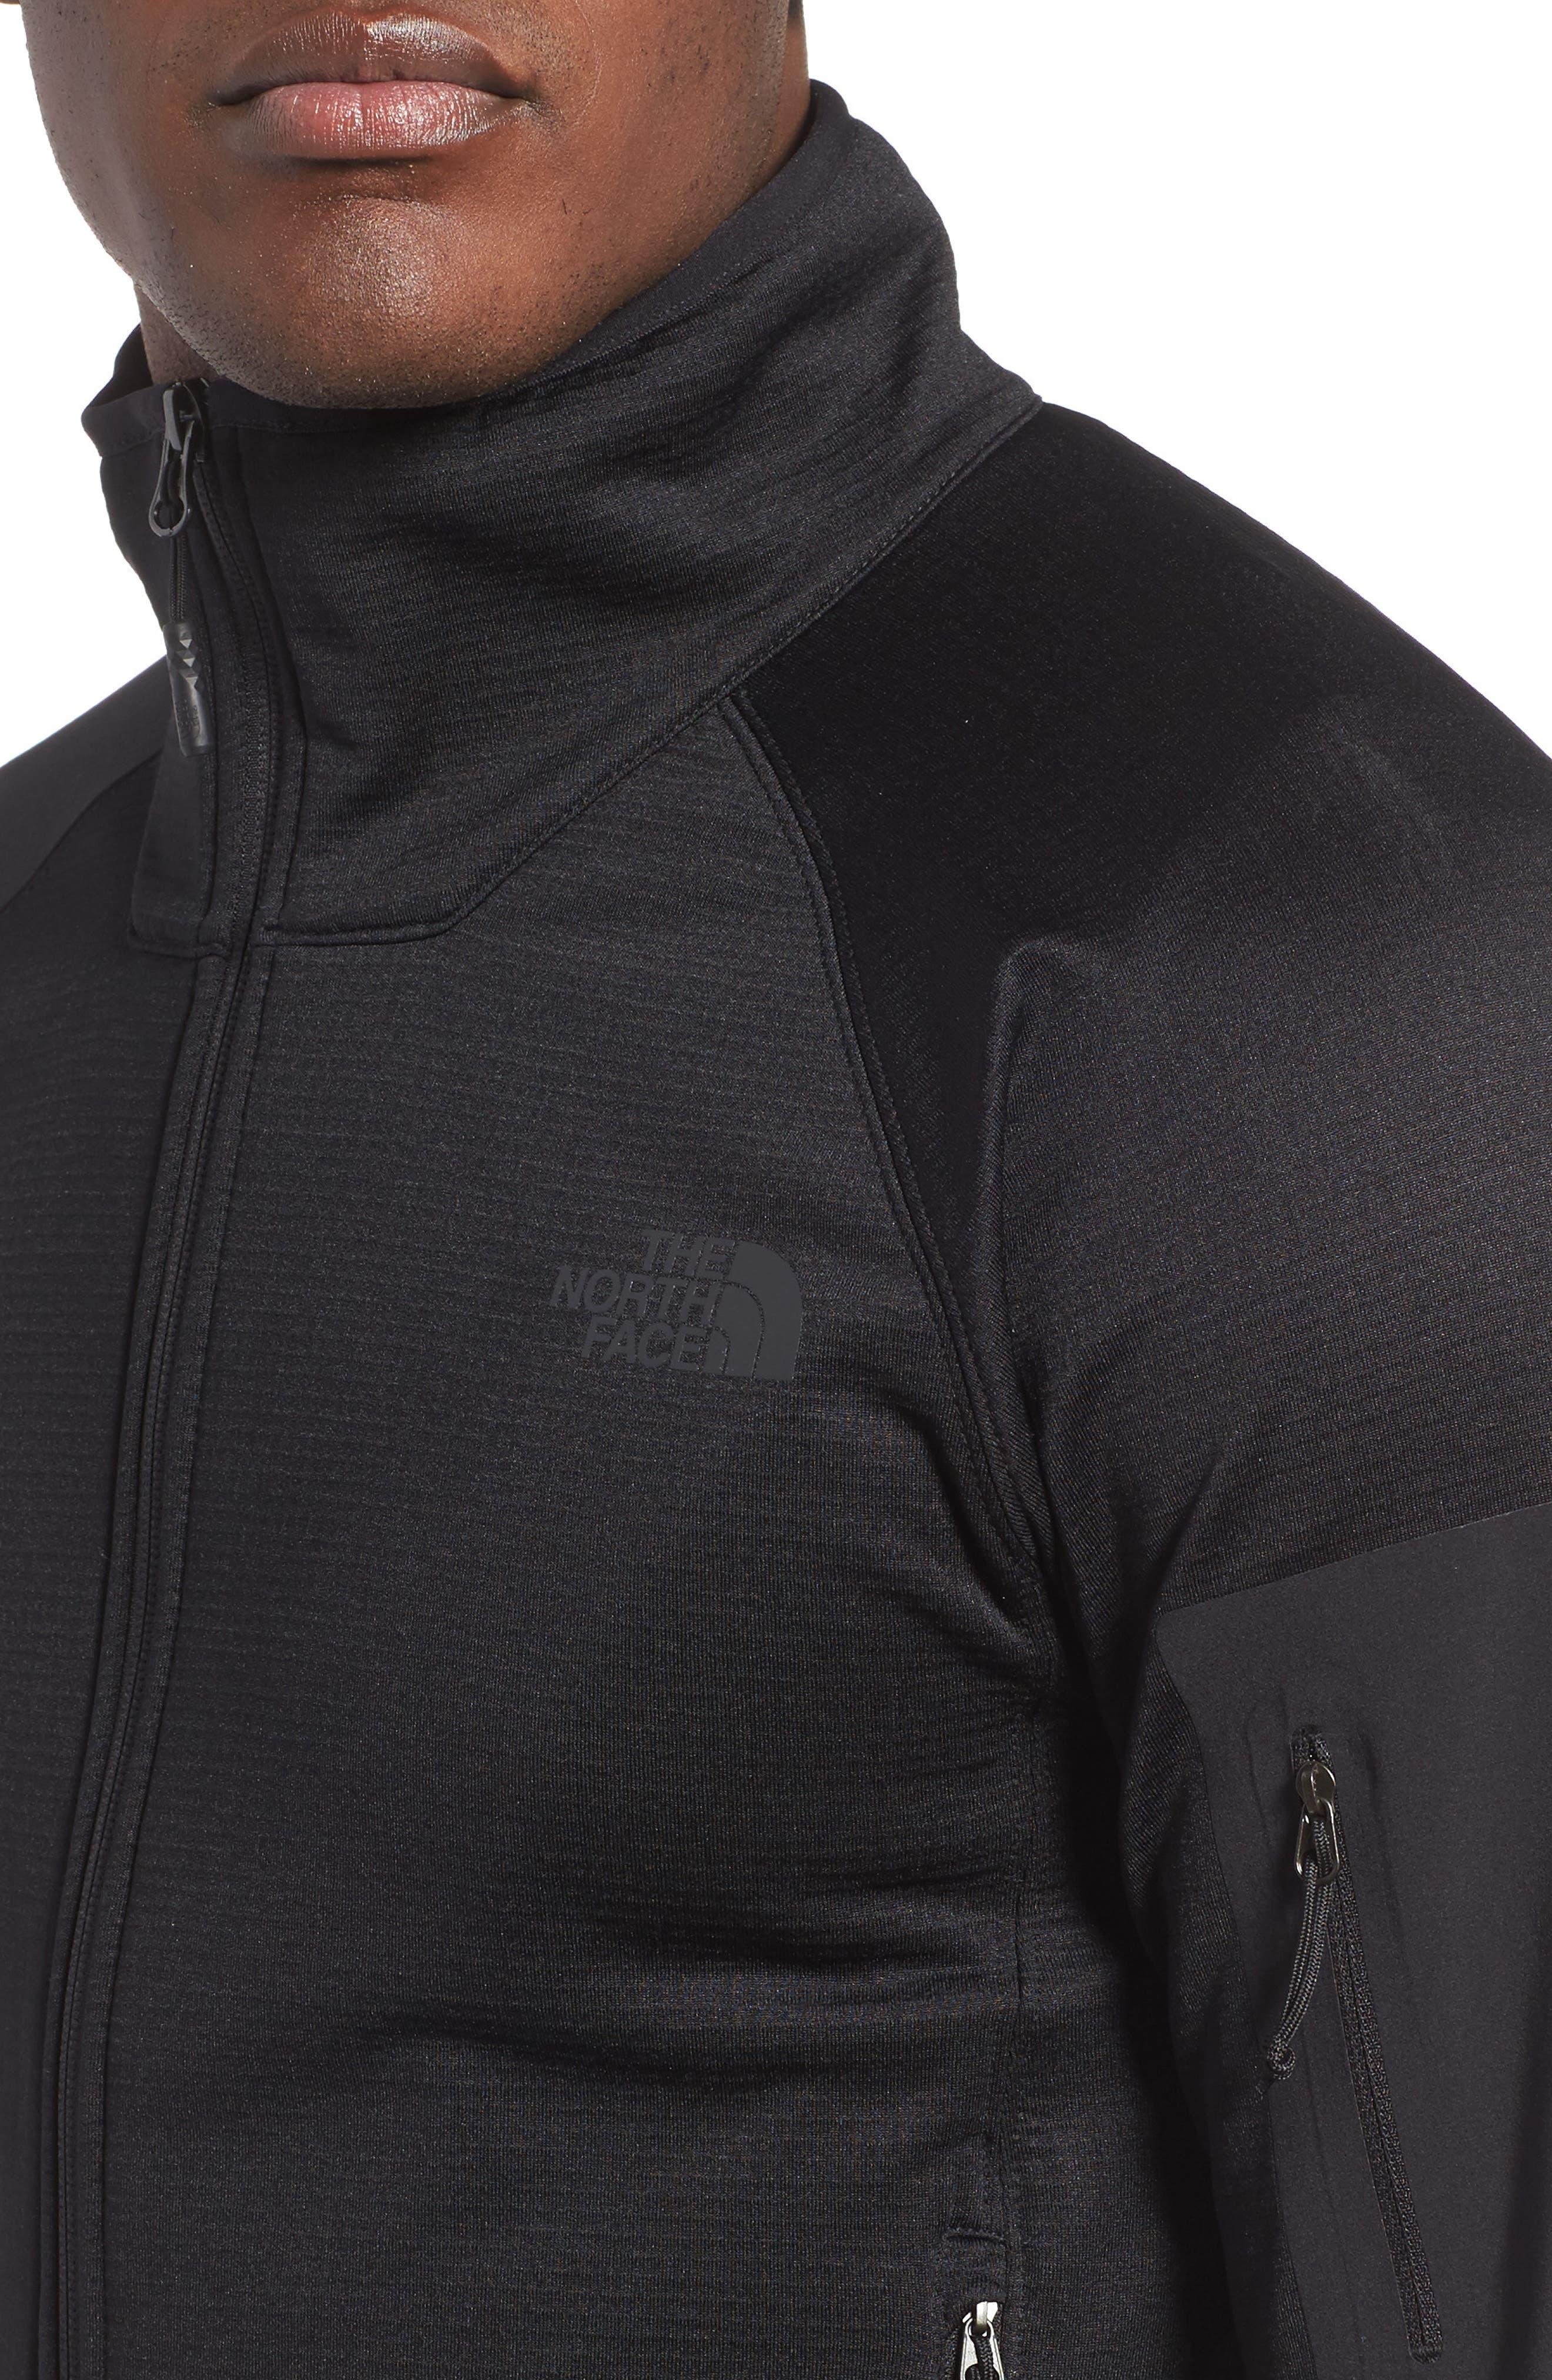 Borod Jacket,                             Alternate thumbnail 4, color,                             TNF BLACK/ TNF BLACK